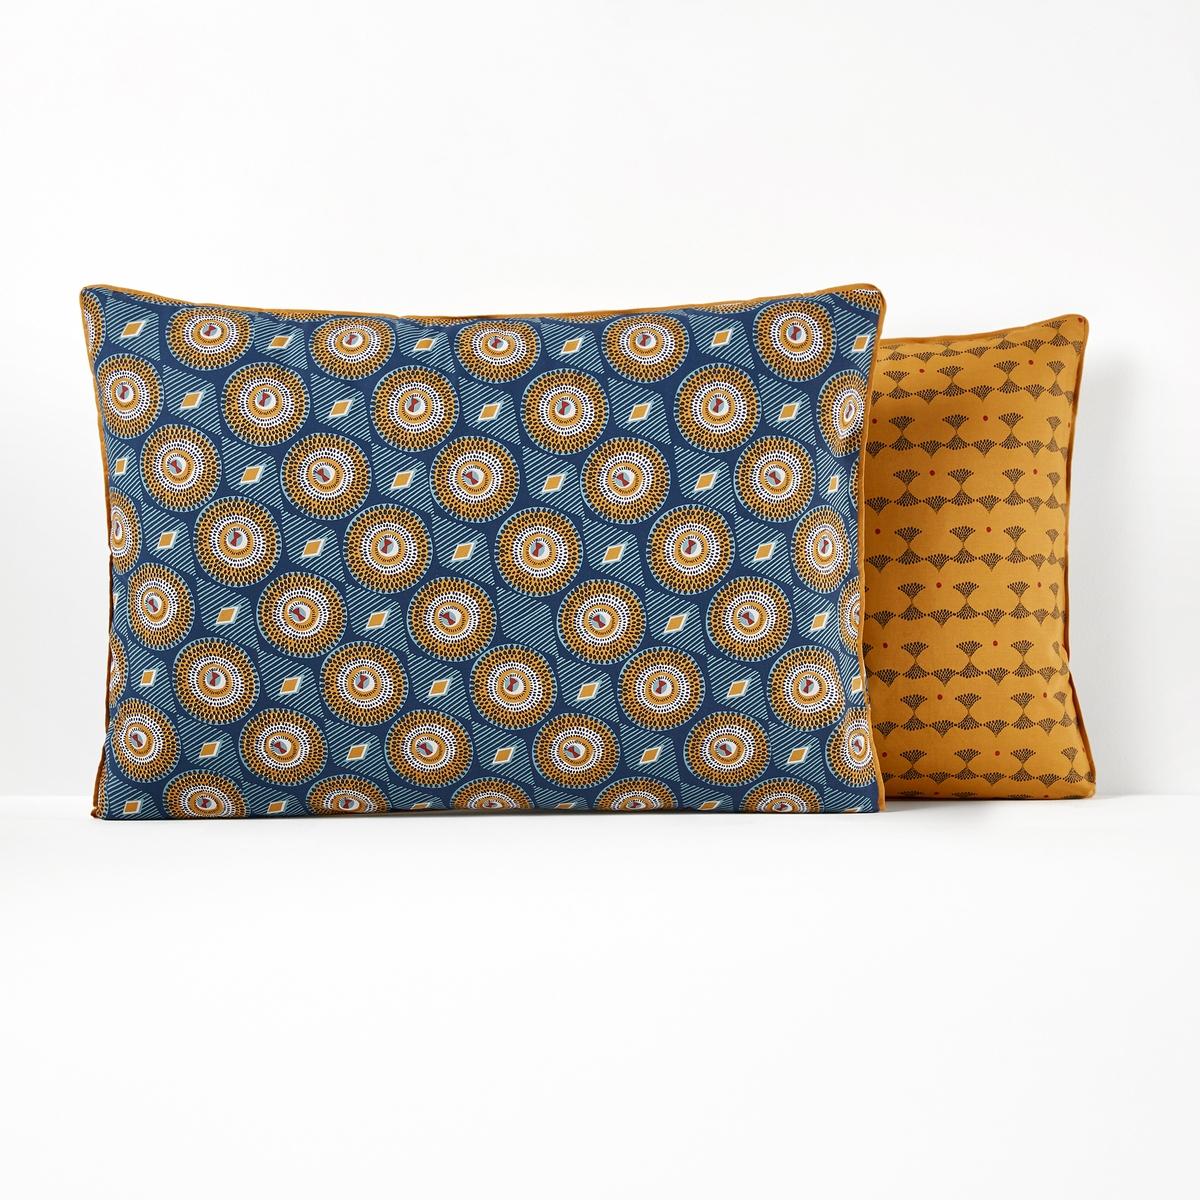 Wax Pure Cotton Pillowcase